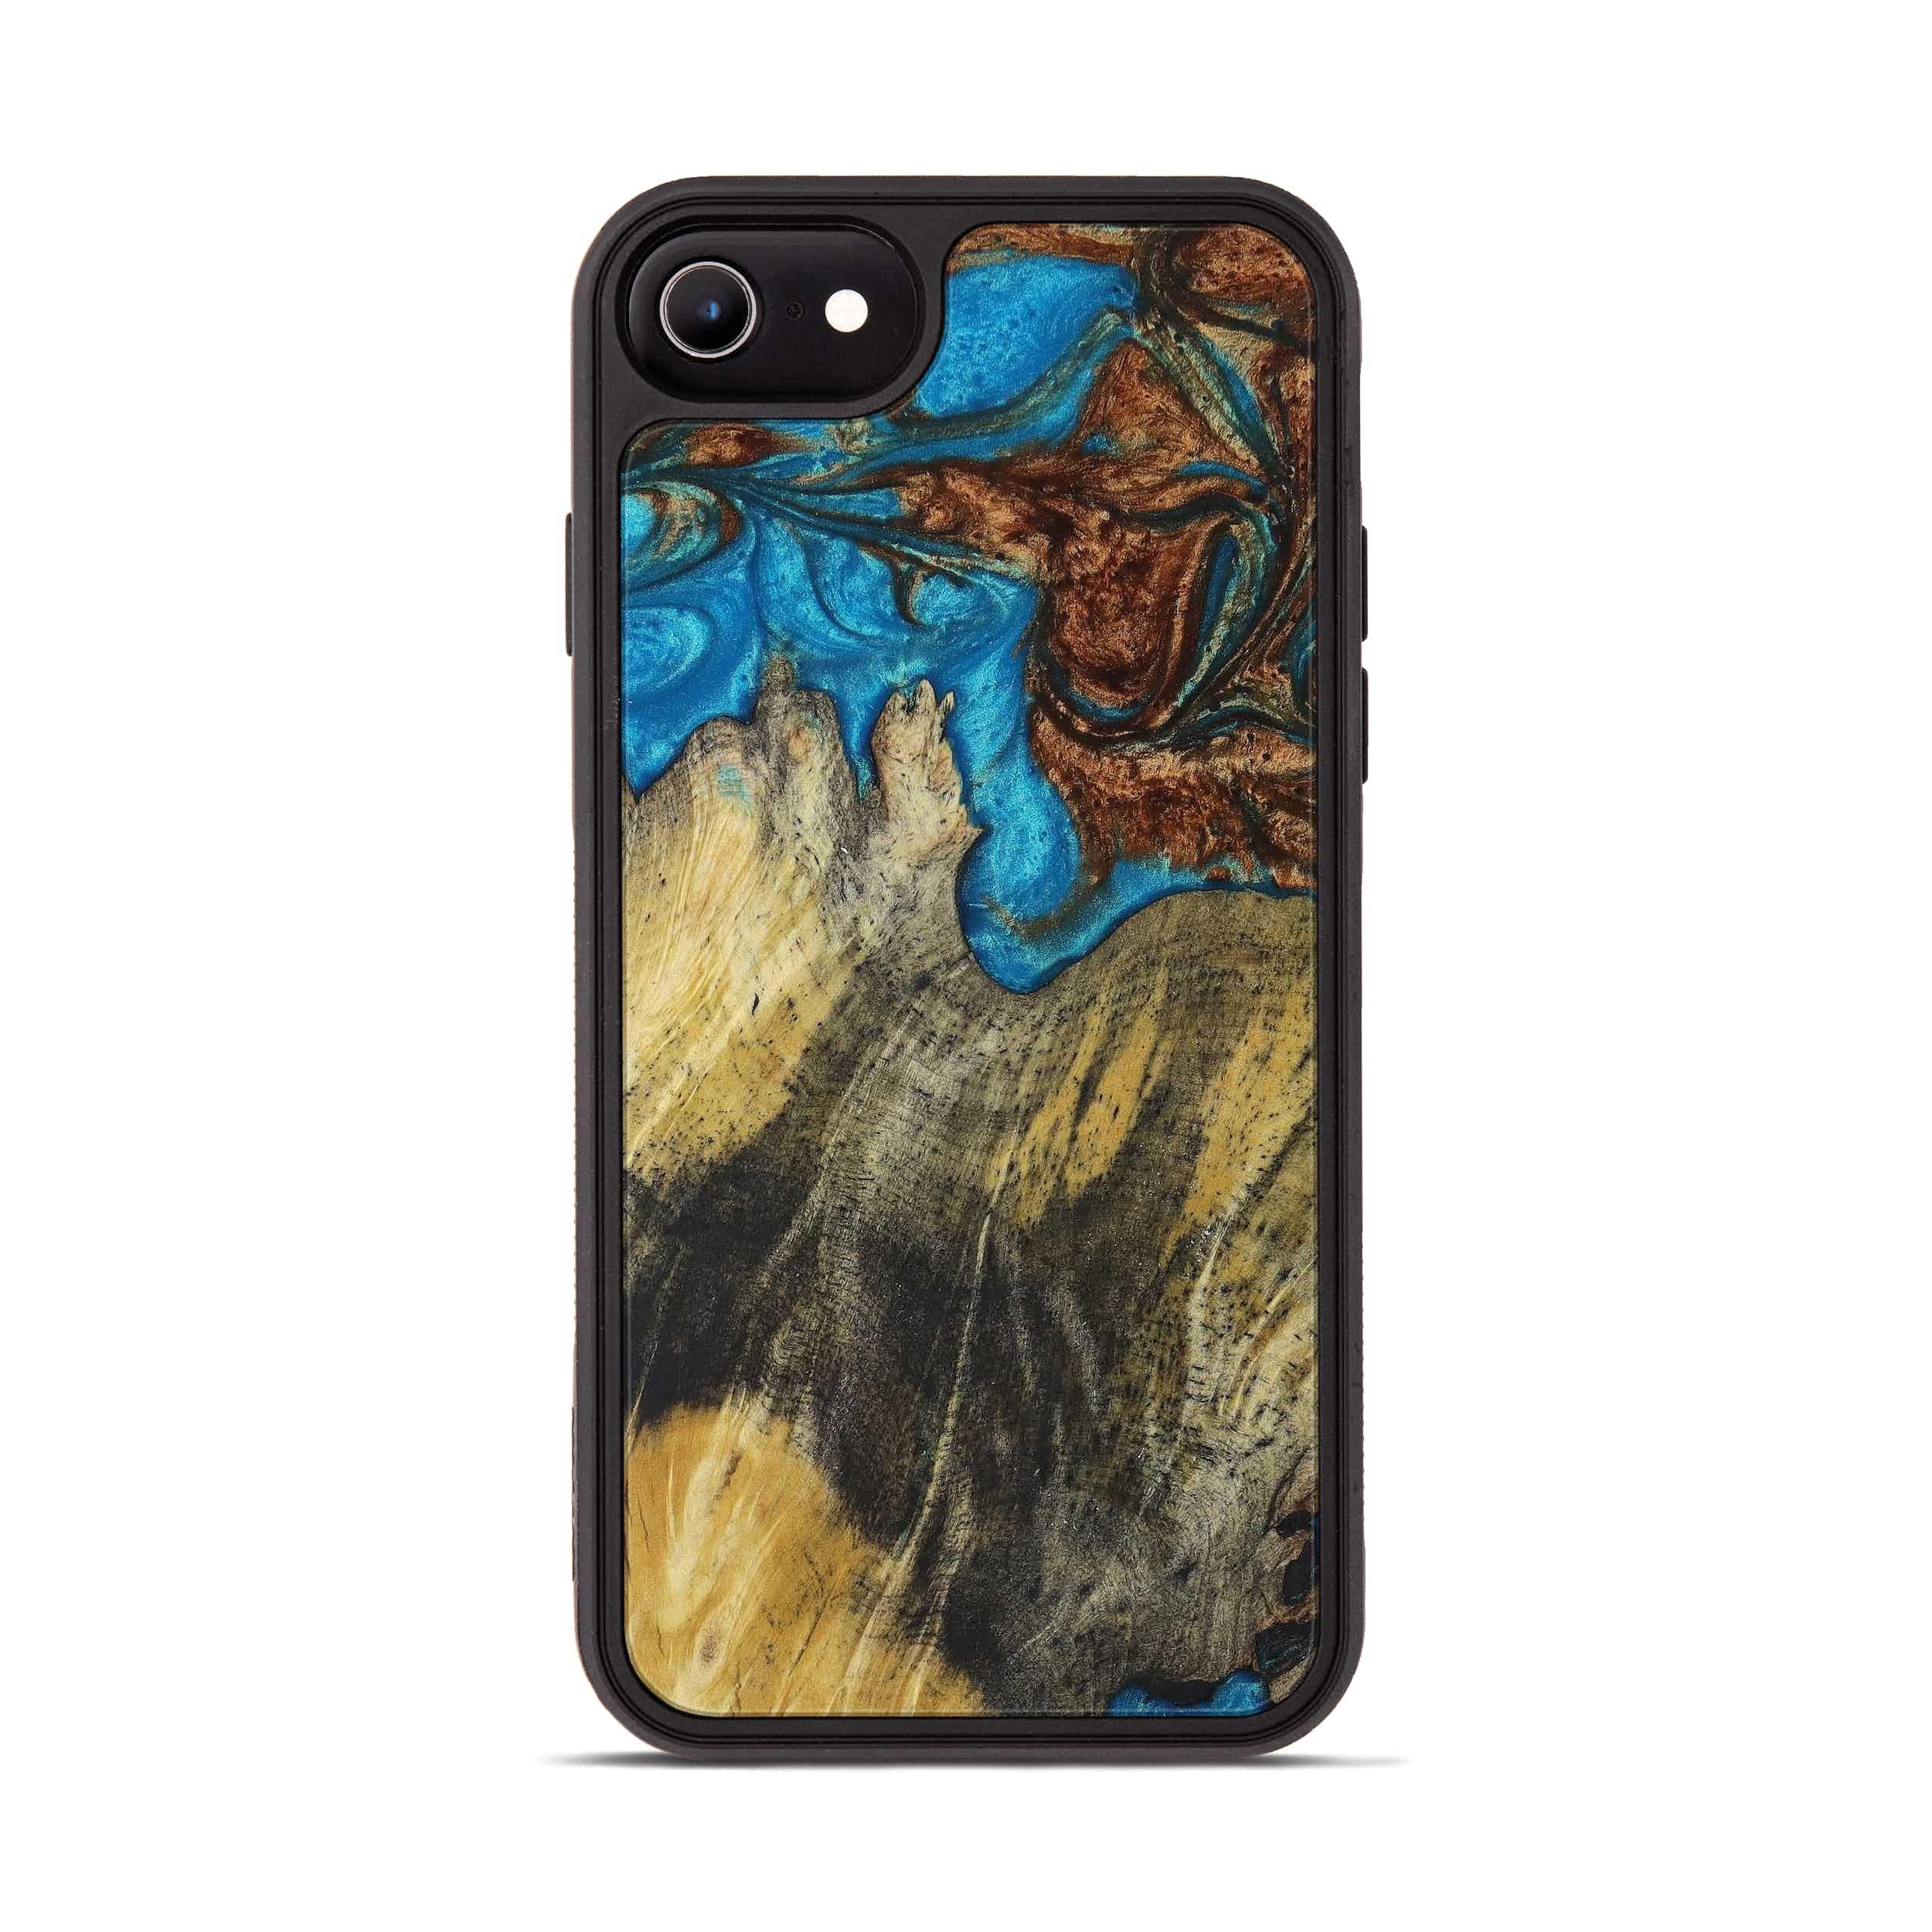 iPhone 6s Wood+Resin Phone Case - Sukhendu (Teal & Gold, 397224)